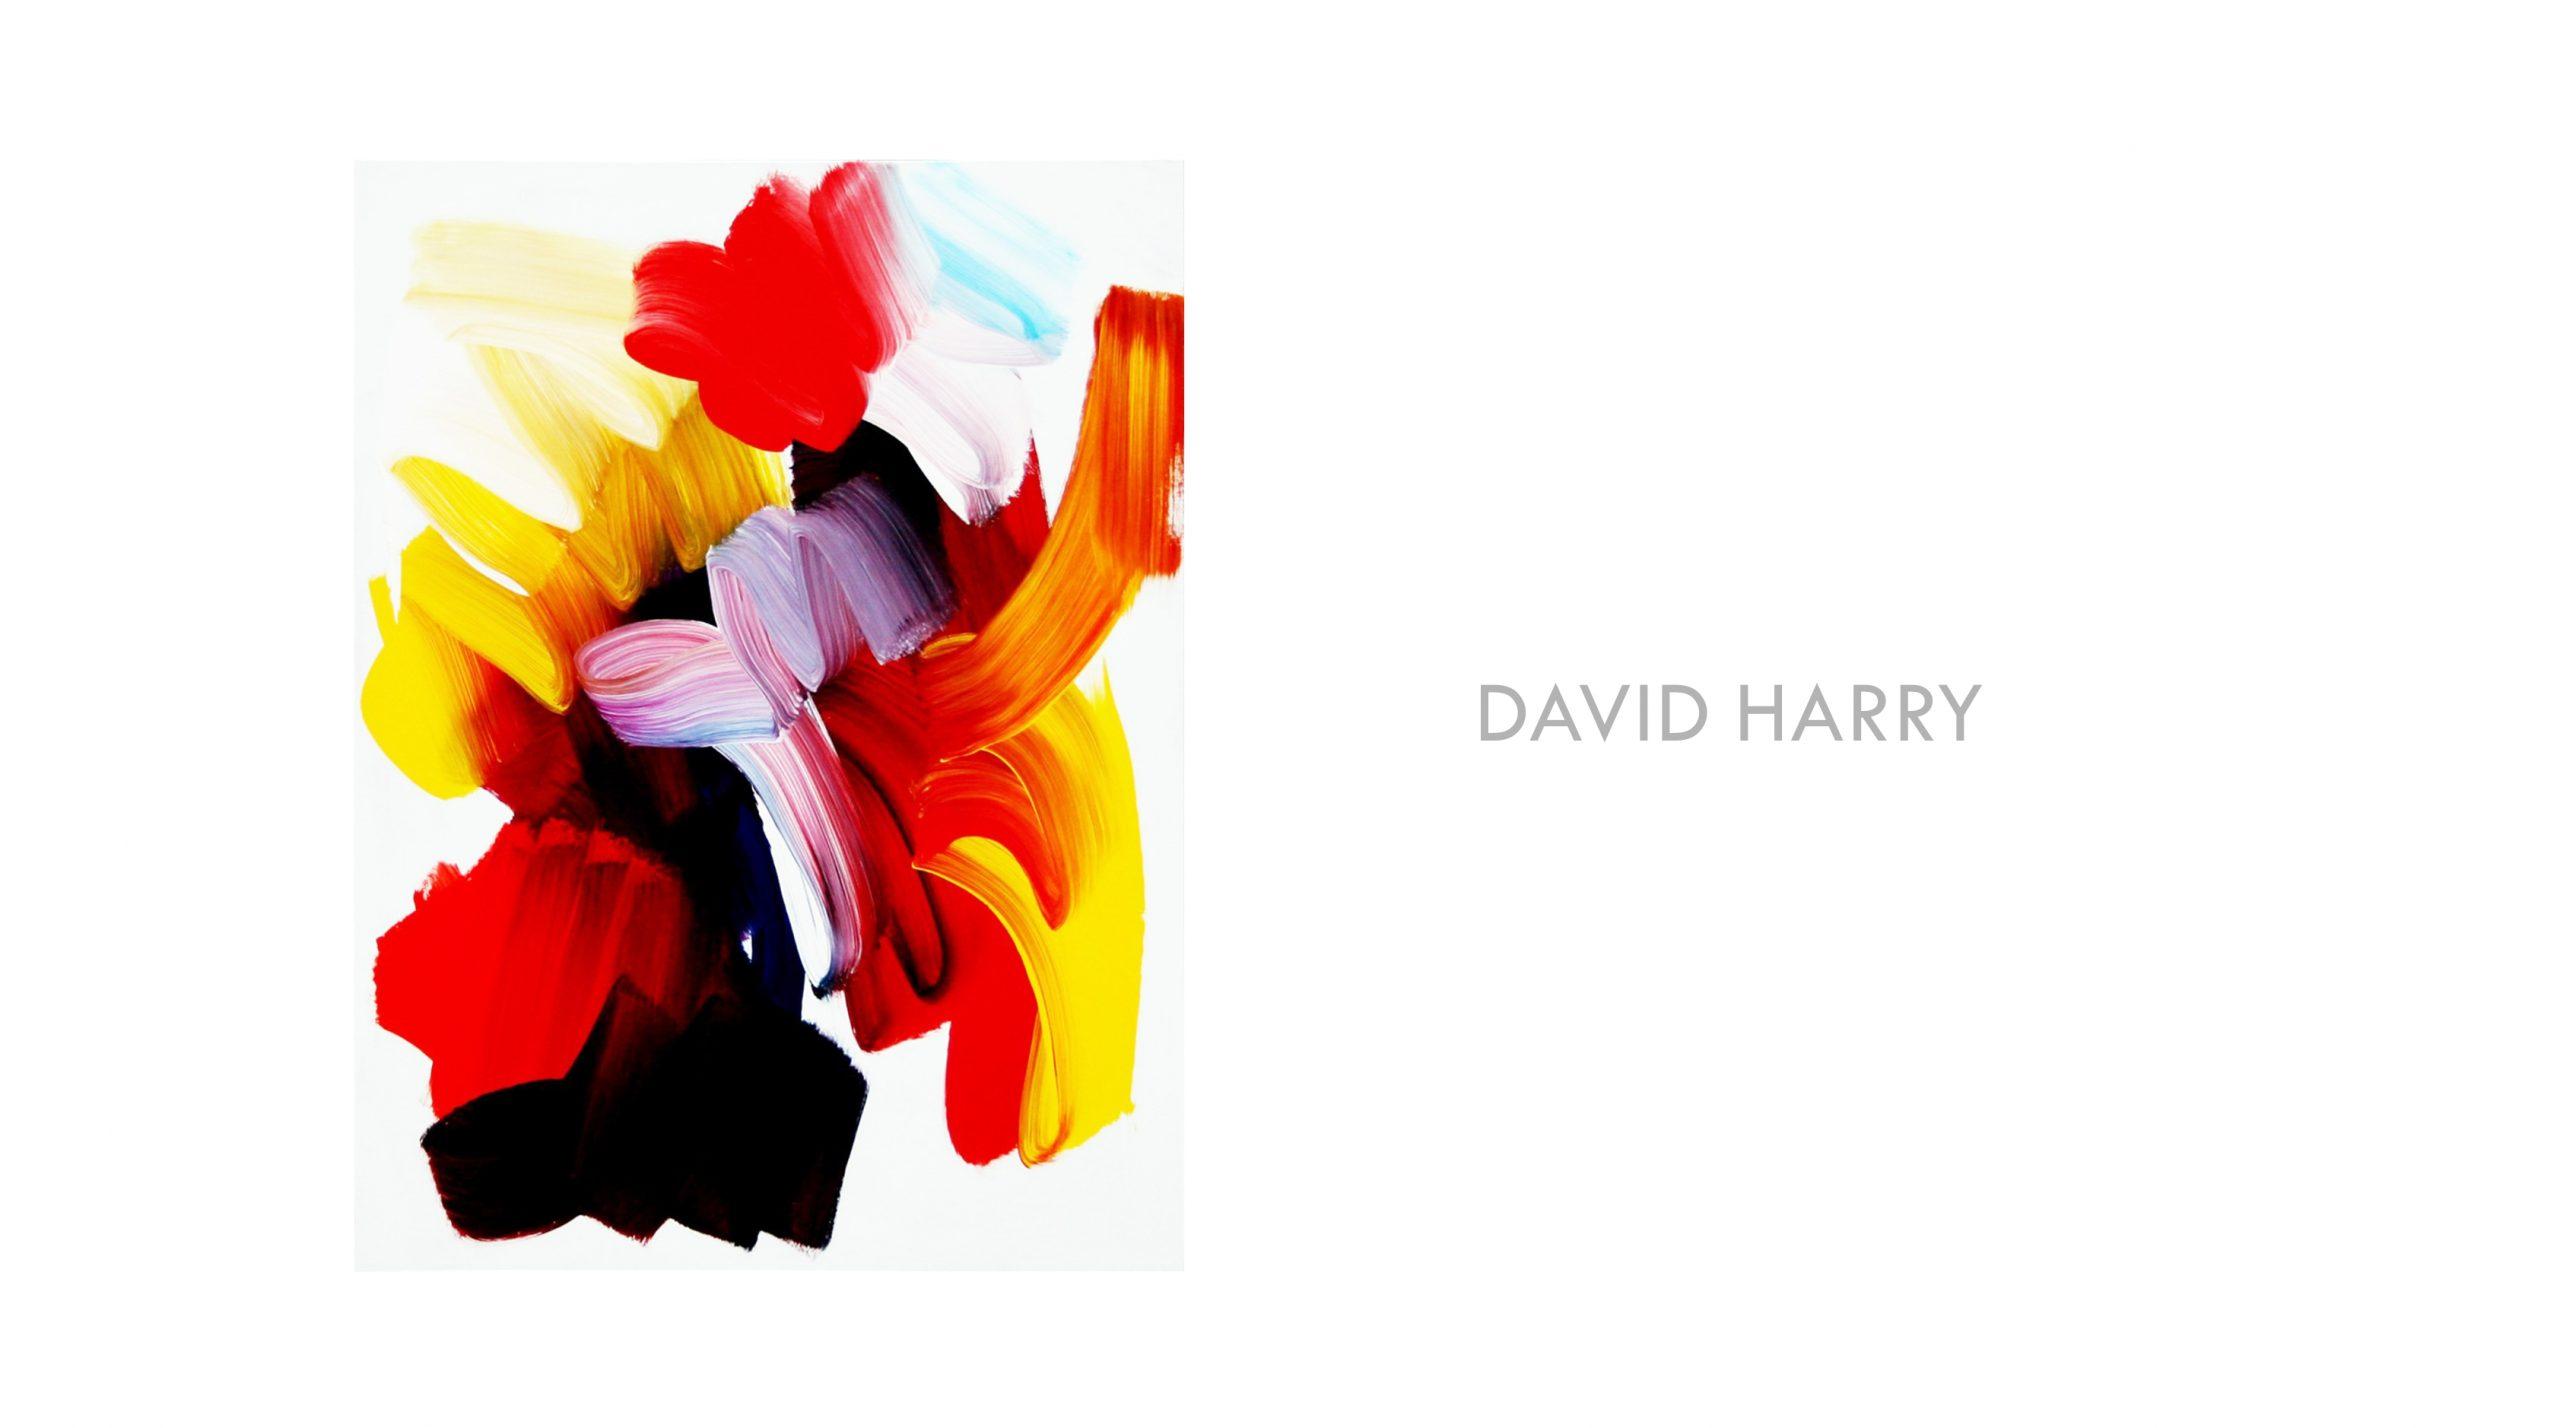 David Harry